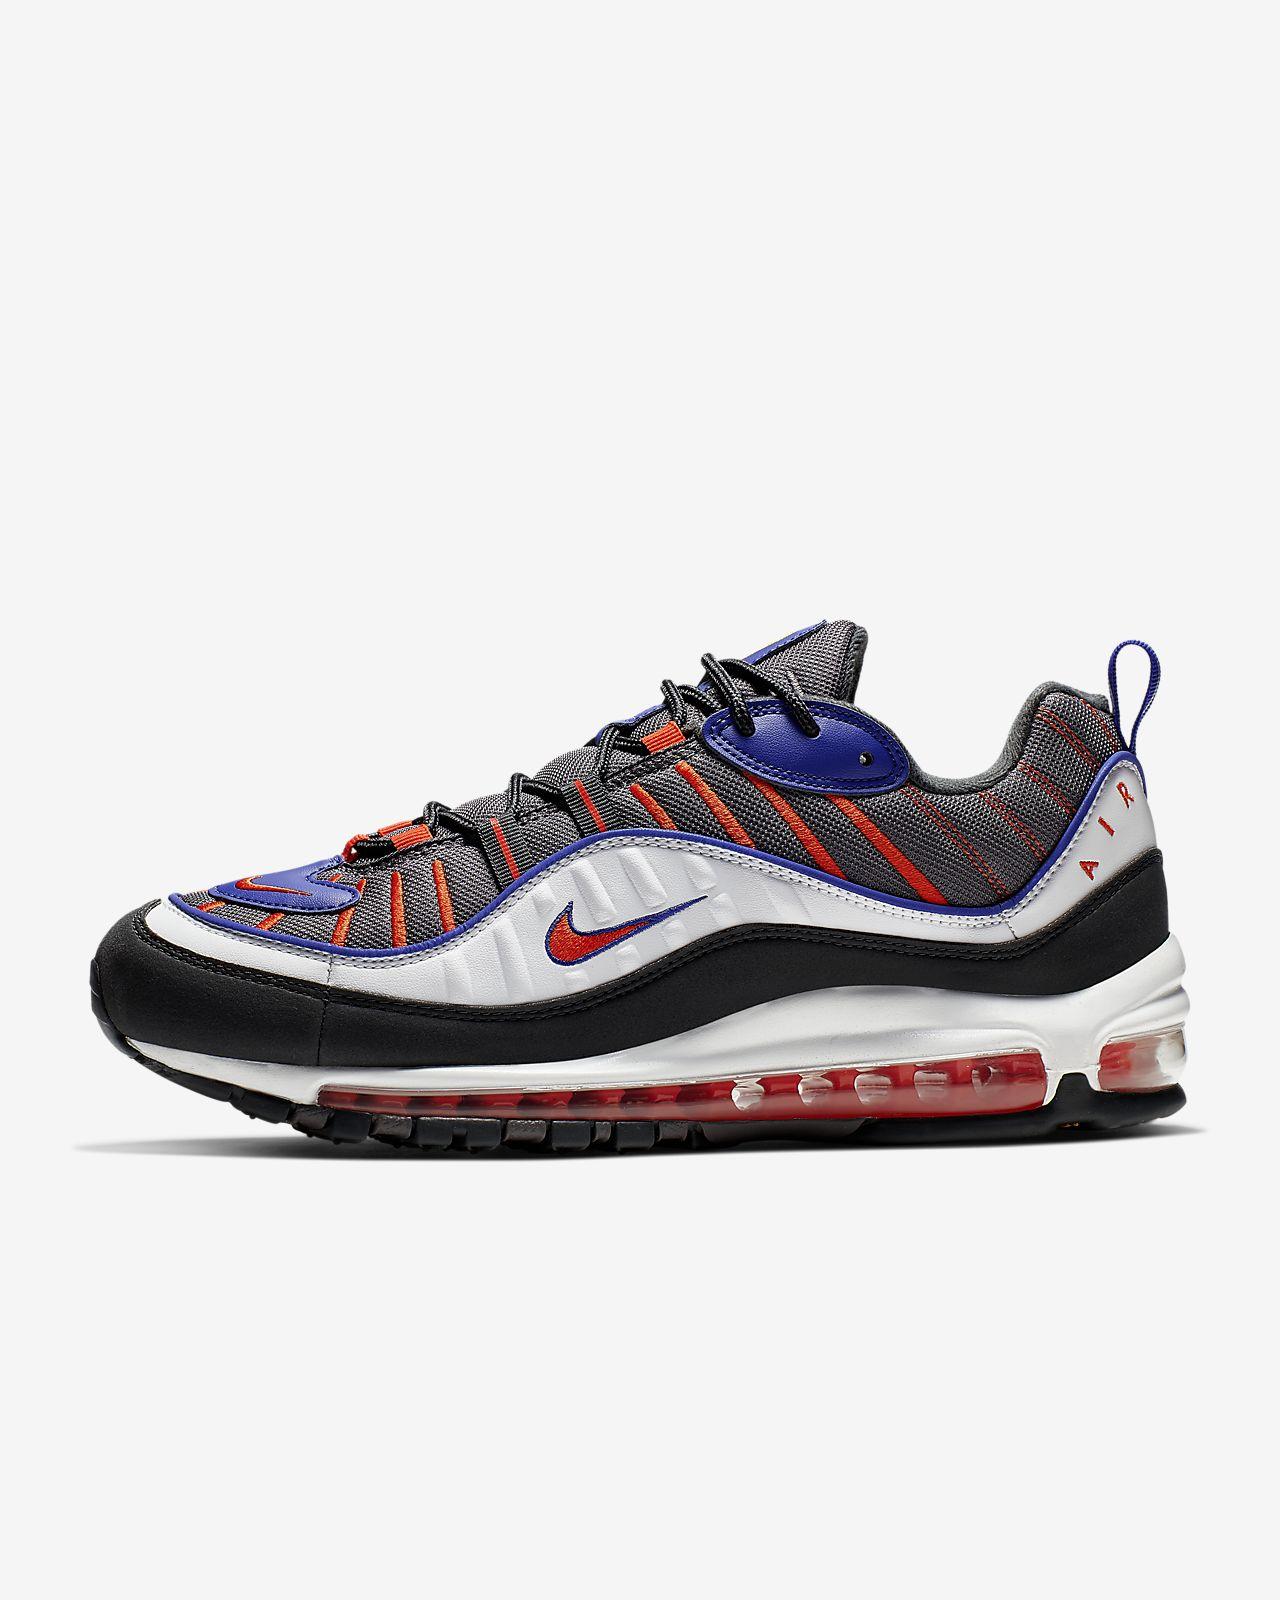 cd46b1b6d1d4 Nike Air Max 98 - sko til mænd. Nike.com DK